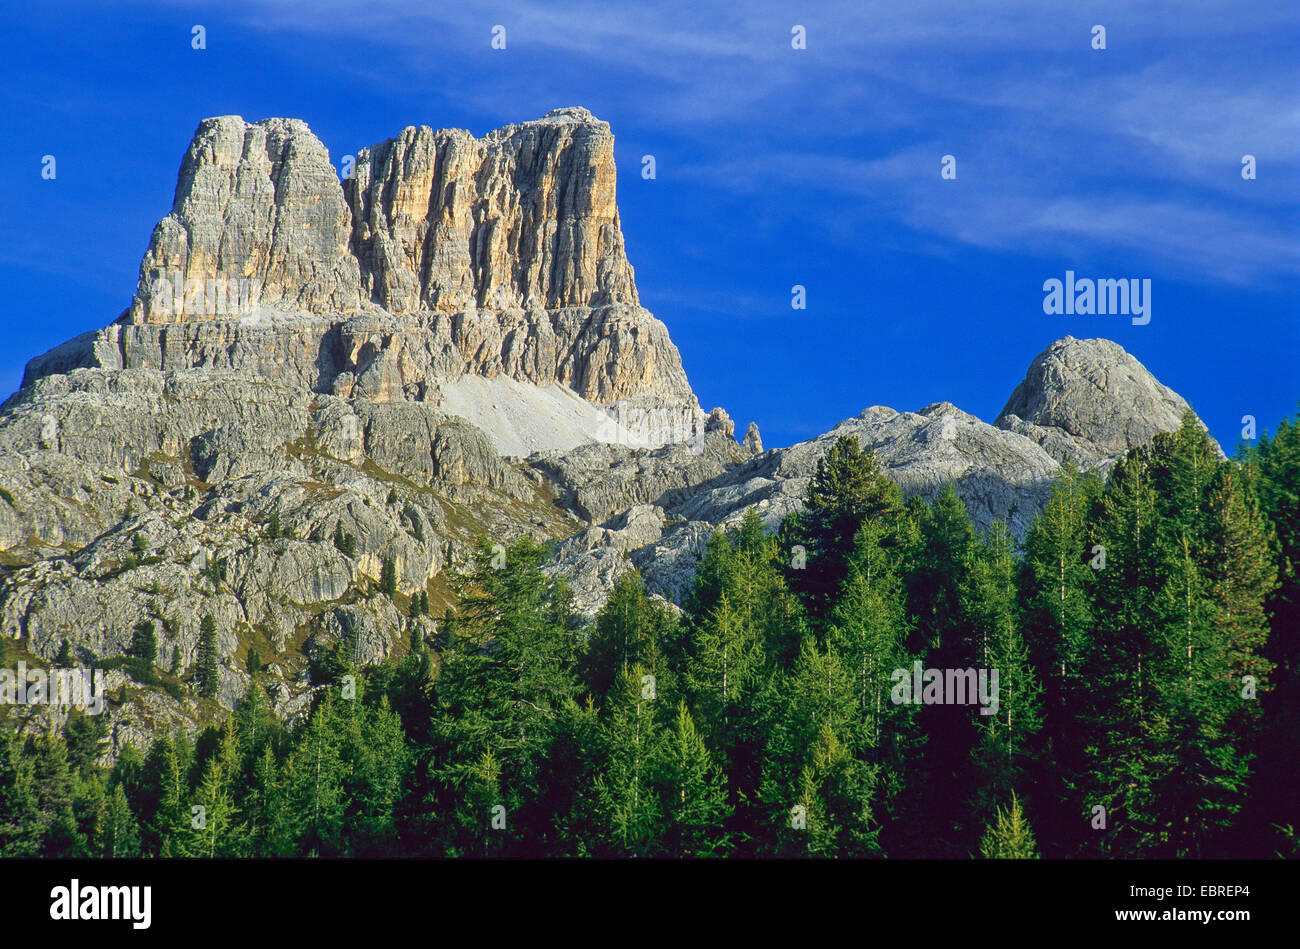 Pass Giau with Ra Gusela and Tofana di Rozes, Italy, South Tyrol, Dolomites - Stock Image